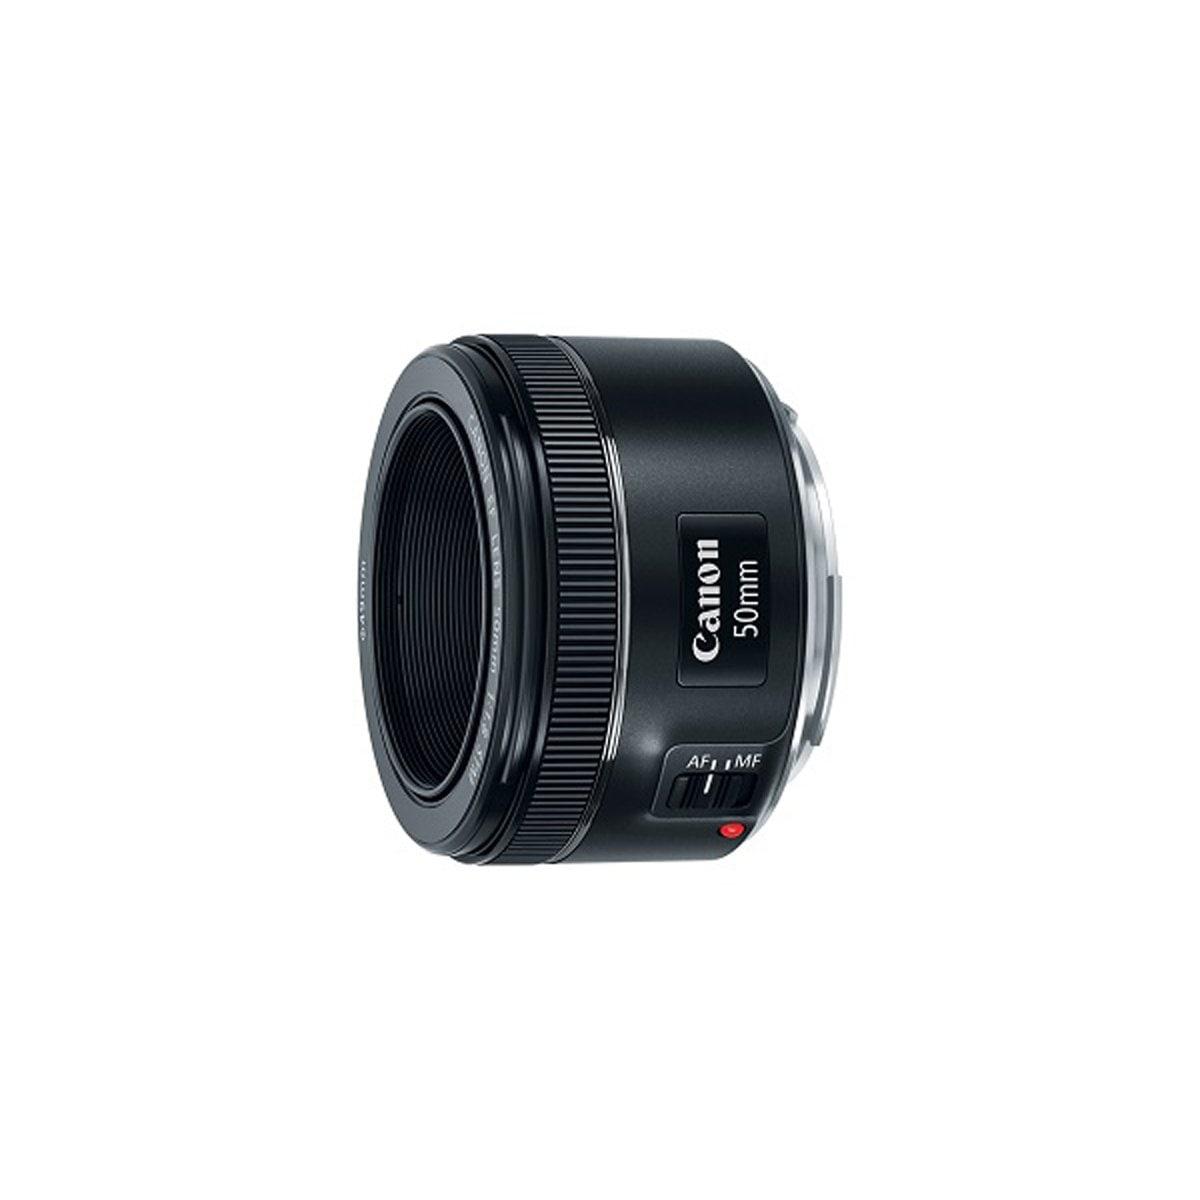 Lente Canon Ef 50Mm F/1.8Stm